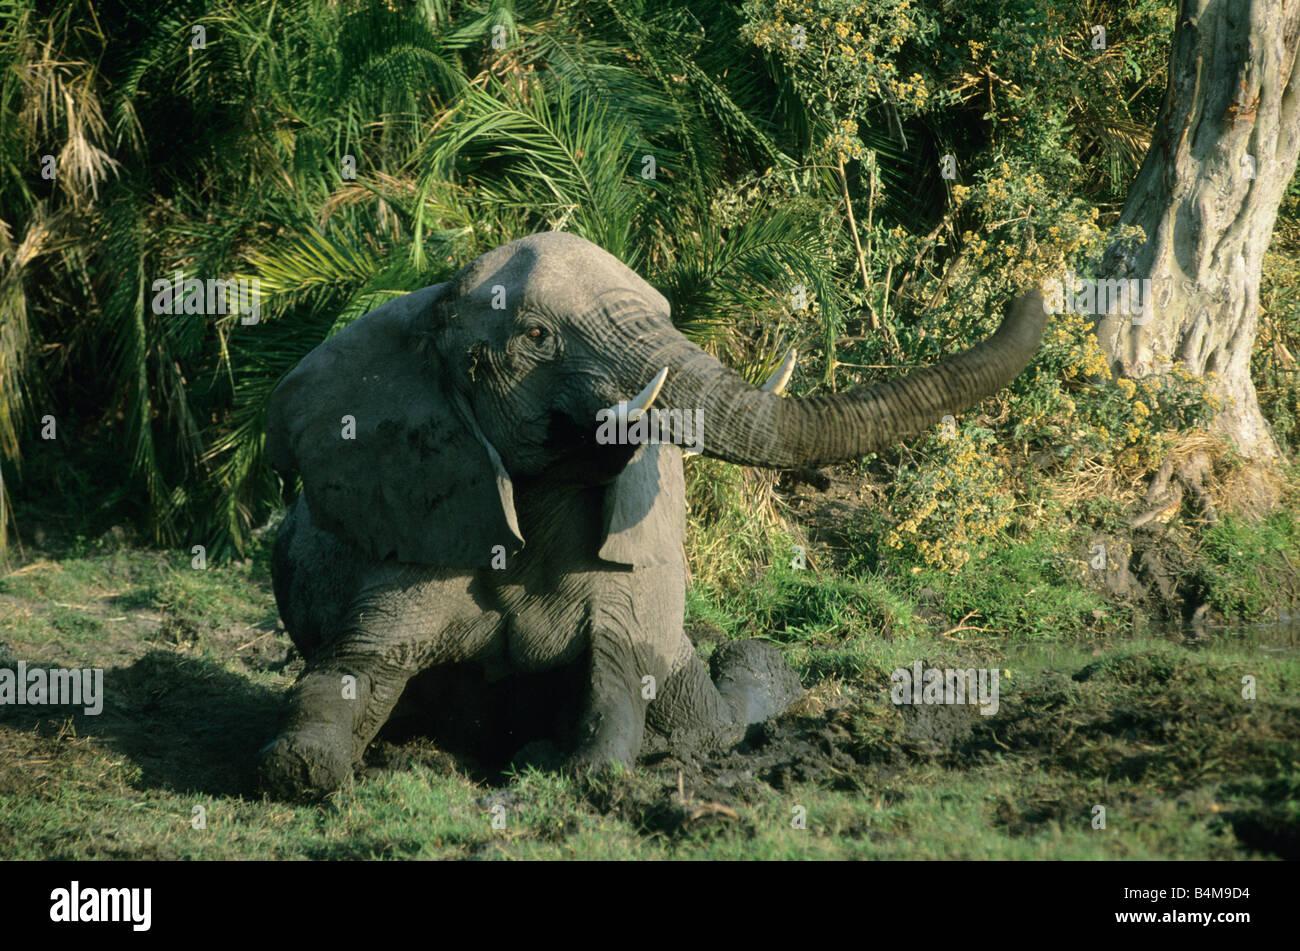 African Elephant (Loxodonta africana) Dirt bathing, Okavango Delta, Botswana - Stock Image